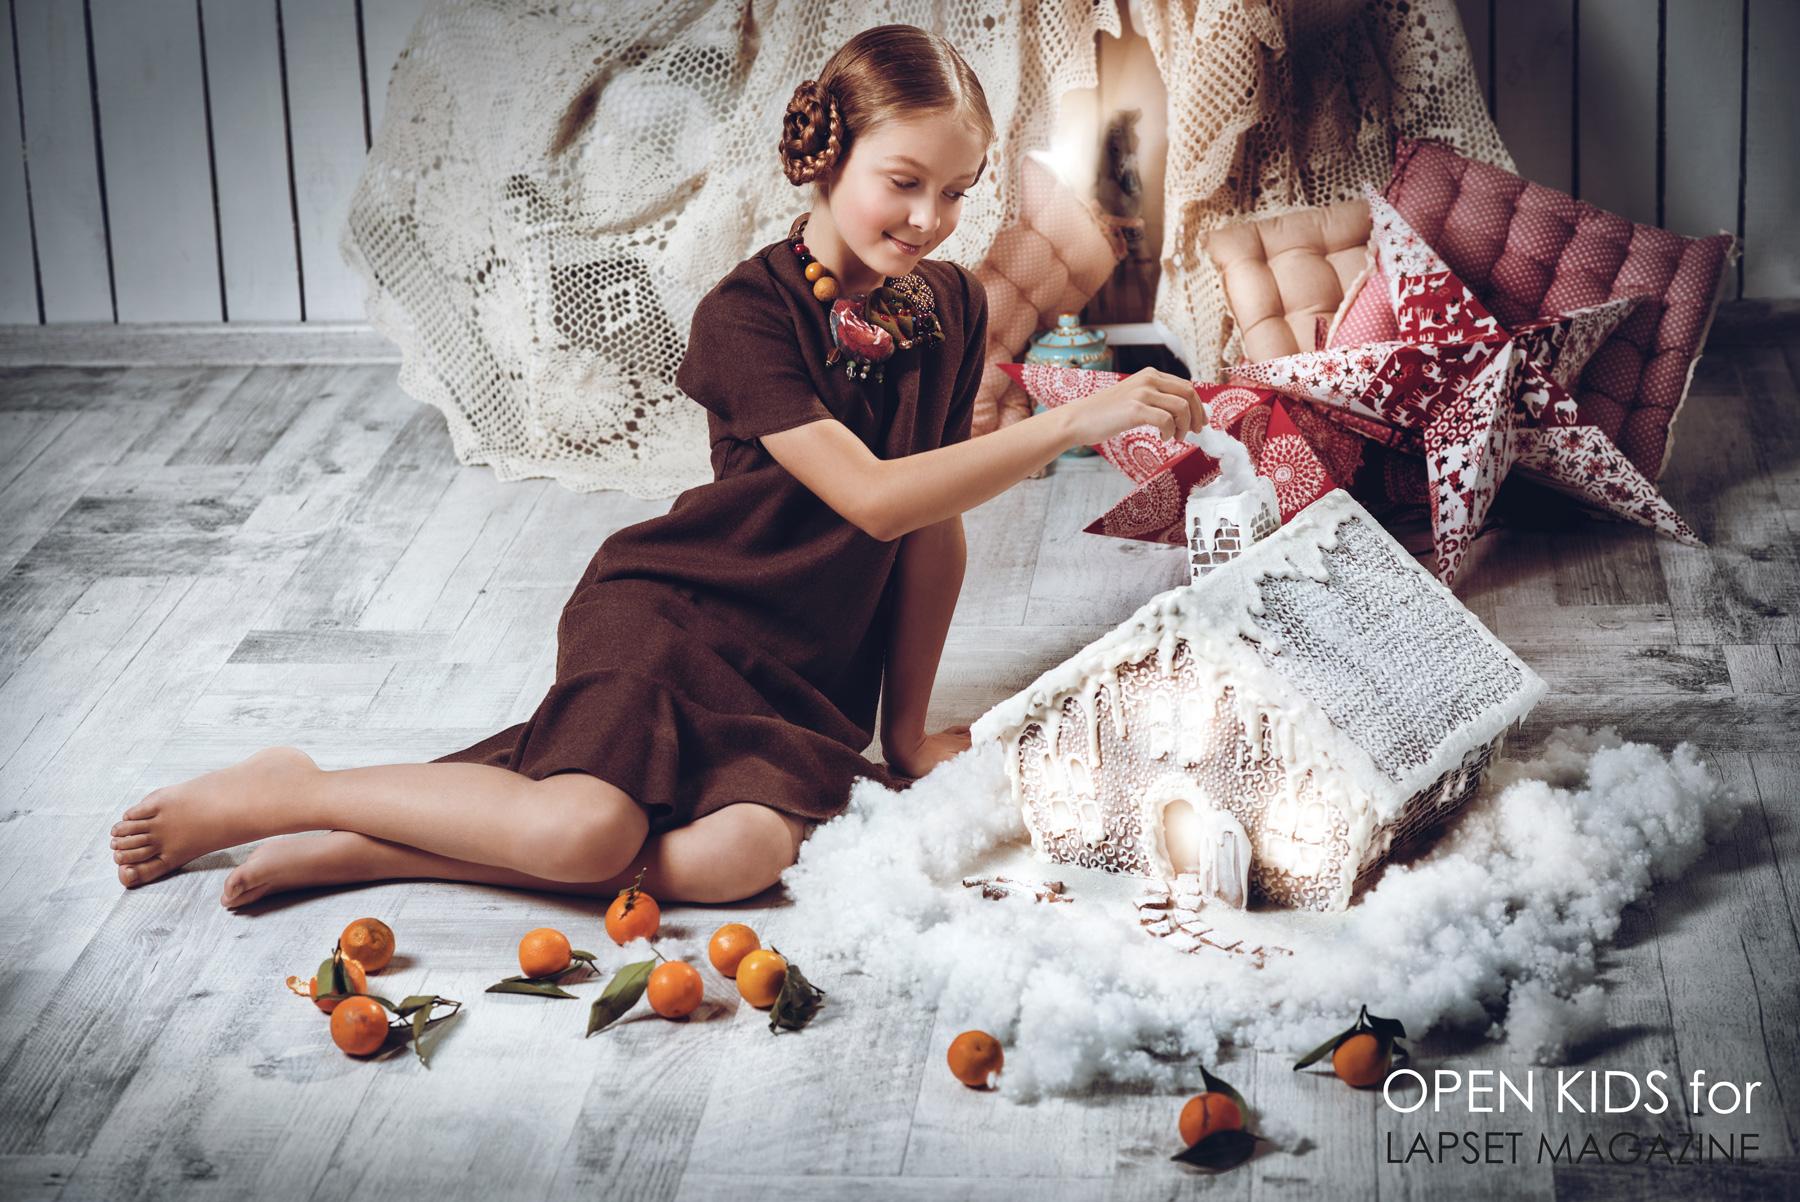 open-kids-lapset-magazine-christmas-03